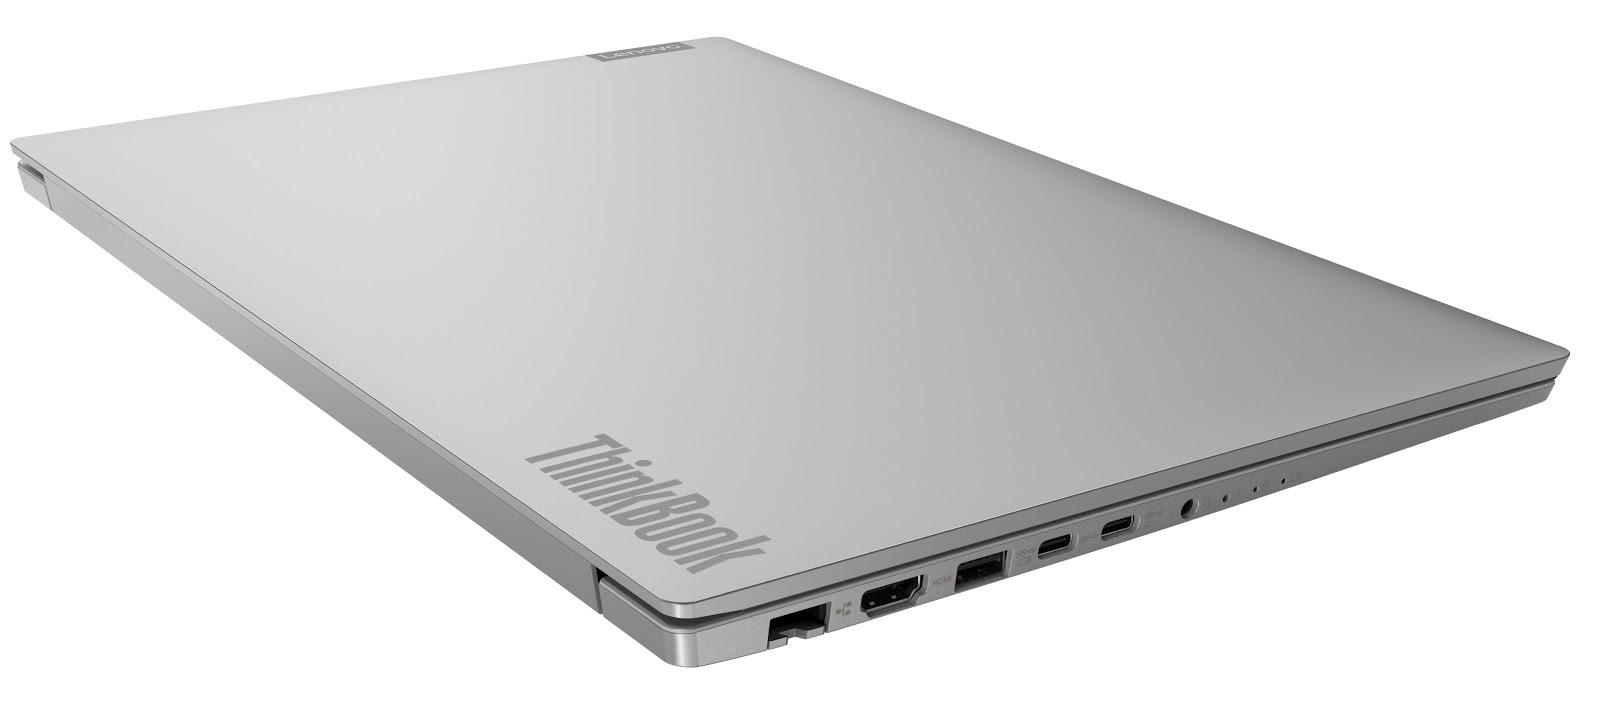 Фото 3. Ноутбук Lenovo ThinkBook 15-IIL (20SM007LRU)